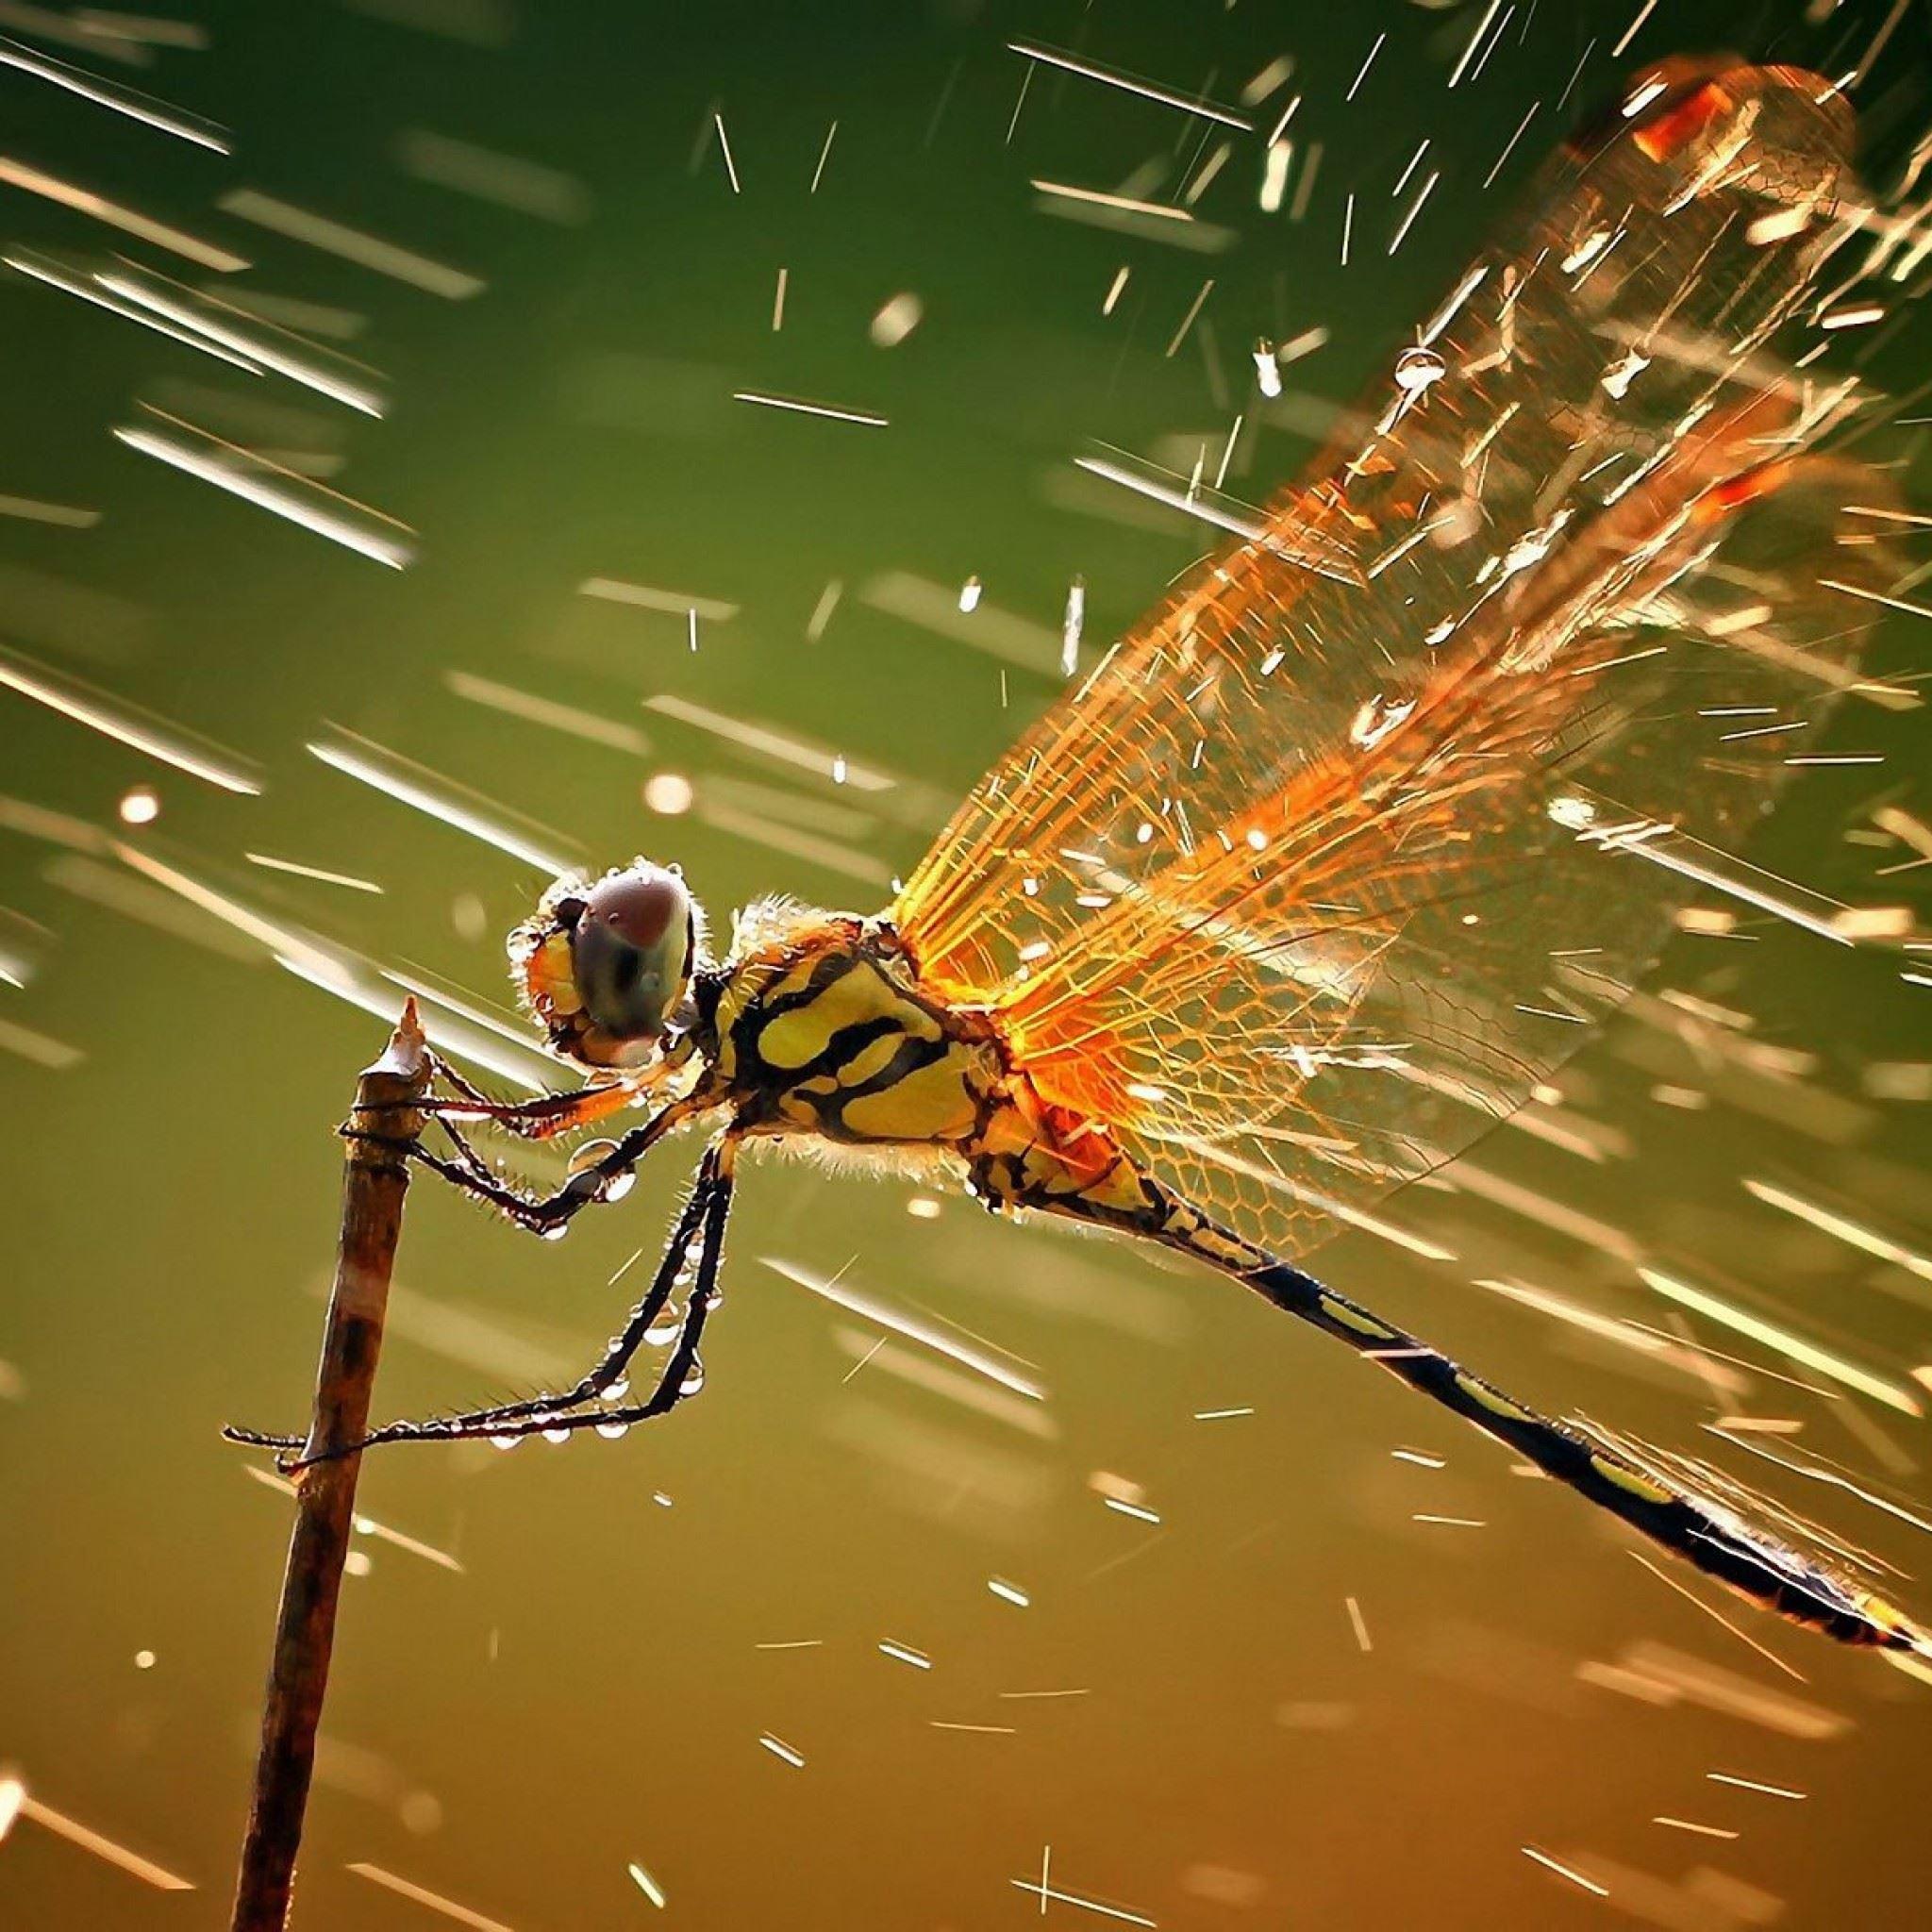 Dragonfly in rain iPad Air wallpaper